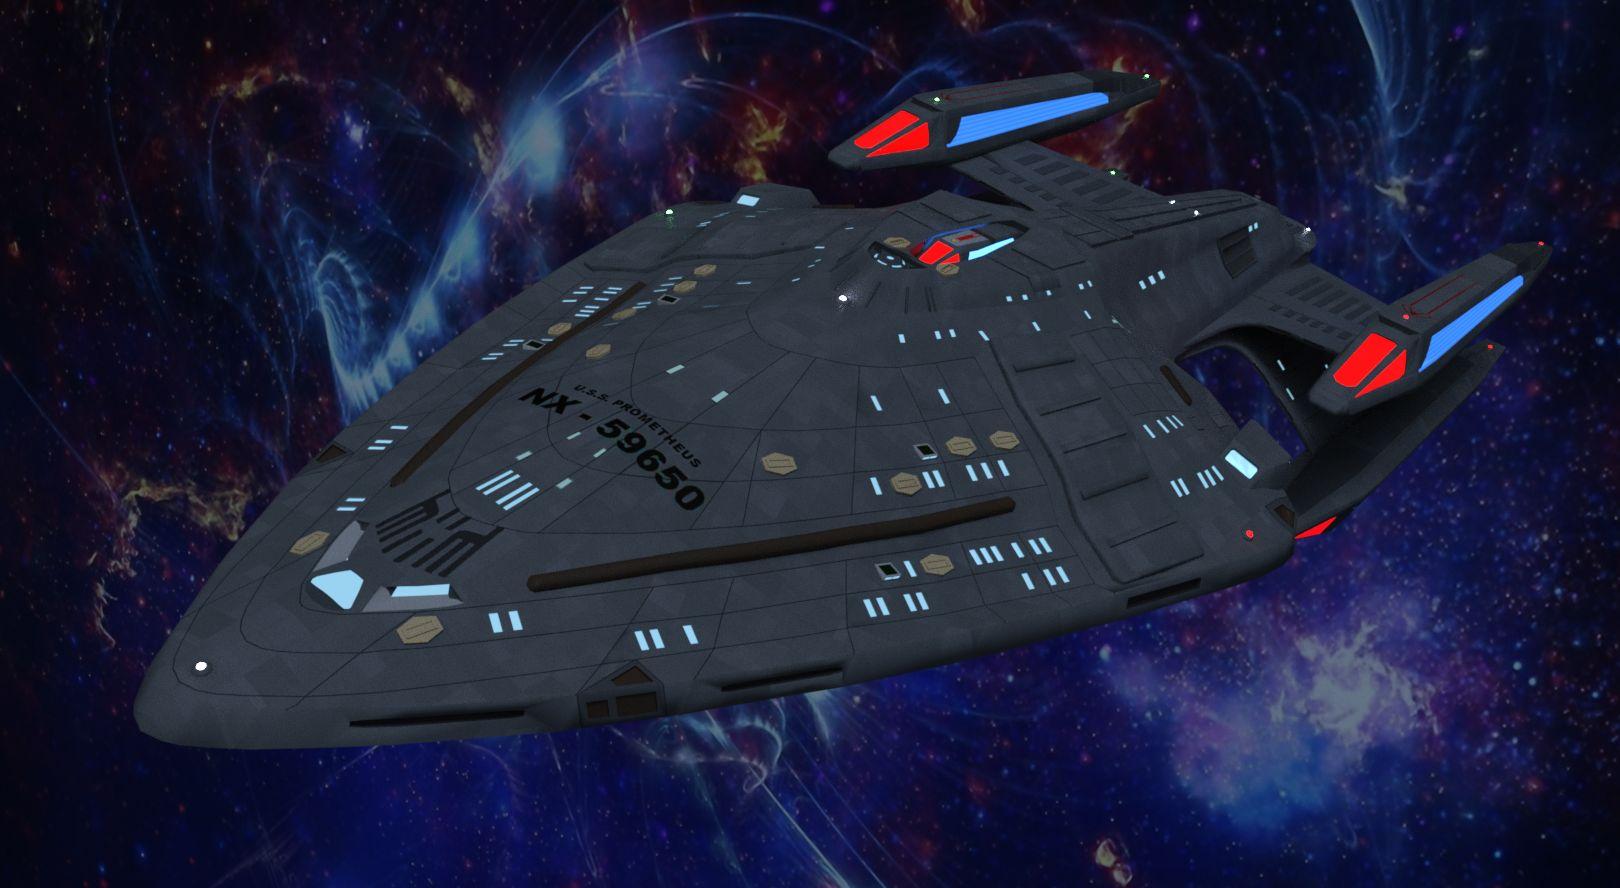 SS Prometheus NX-59650_01